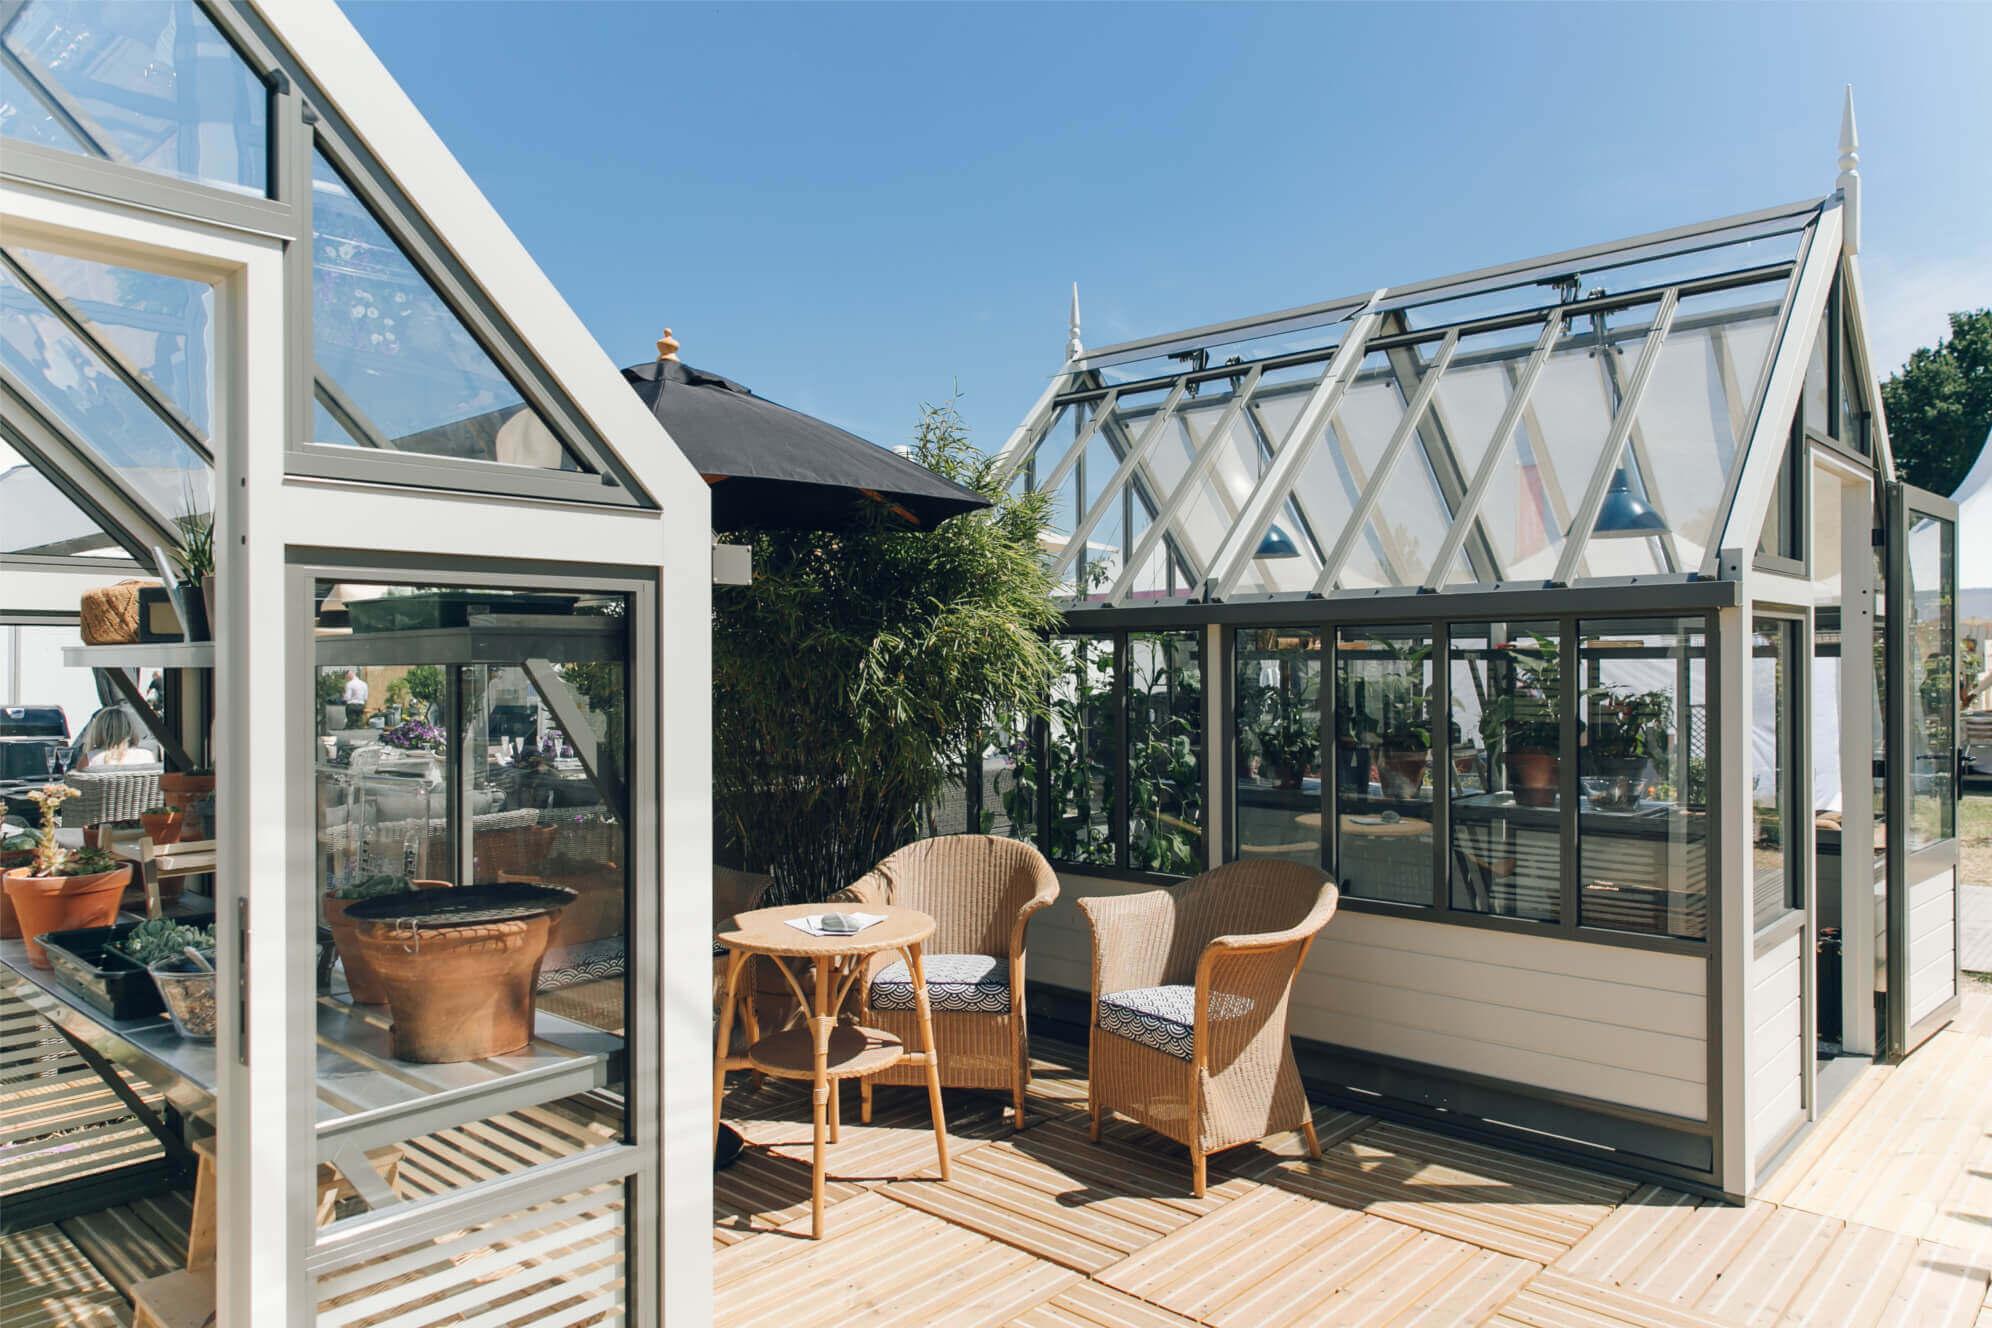 The New range of Aluminium Greenhouses